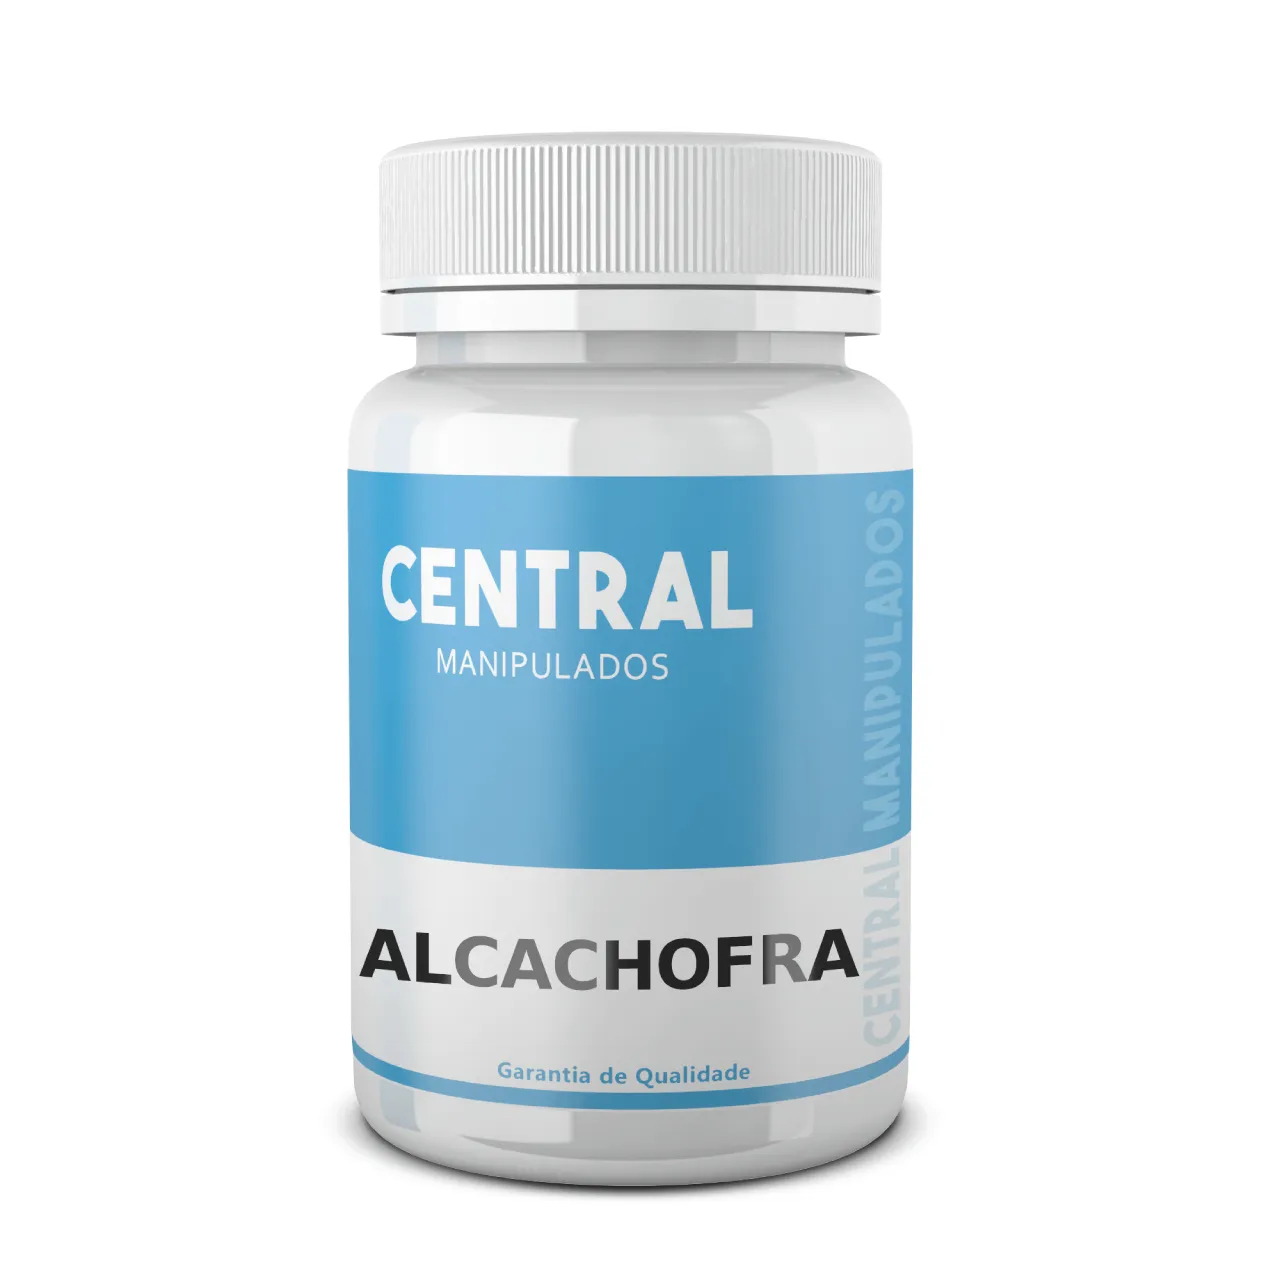 Alcachofra 250mg - 120 cápsulas - Diurético, Antioxidante, Hepatoprotetora